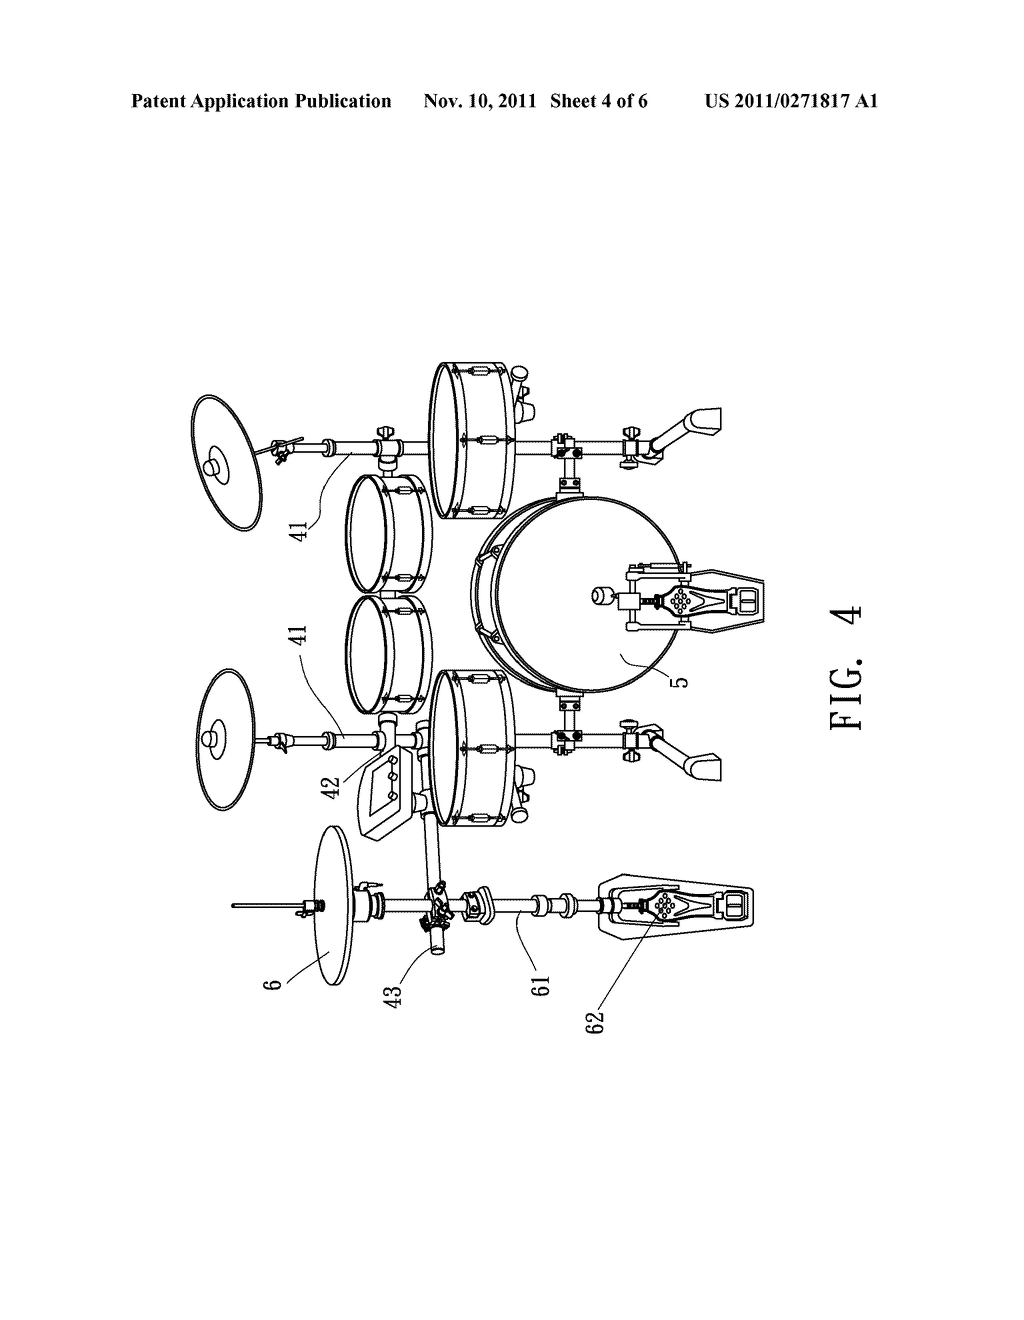 drum kit rack system diagram schematic and image 05 rh patentsencyclopedia com drum kit diagram with labels drum kit diagram with labels